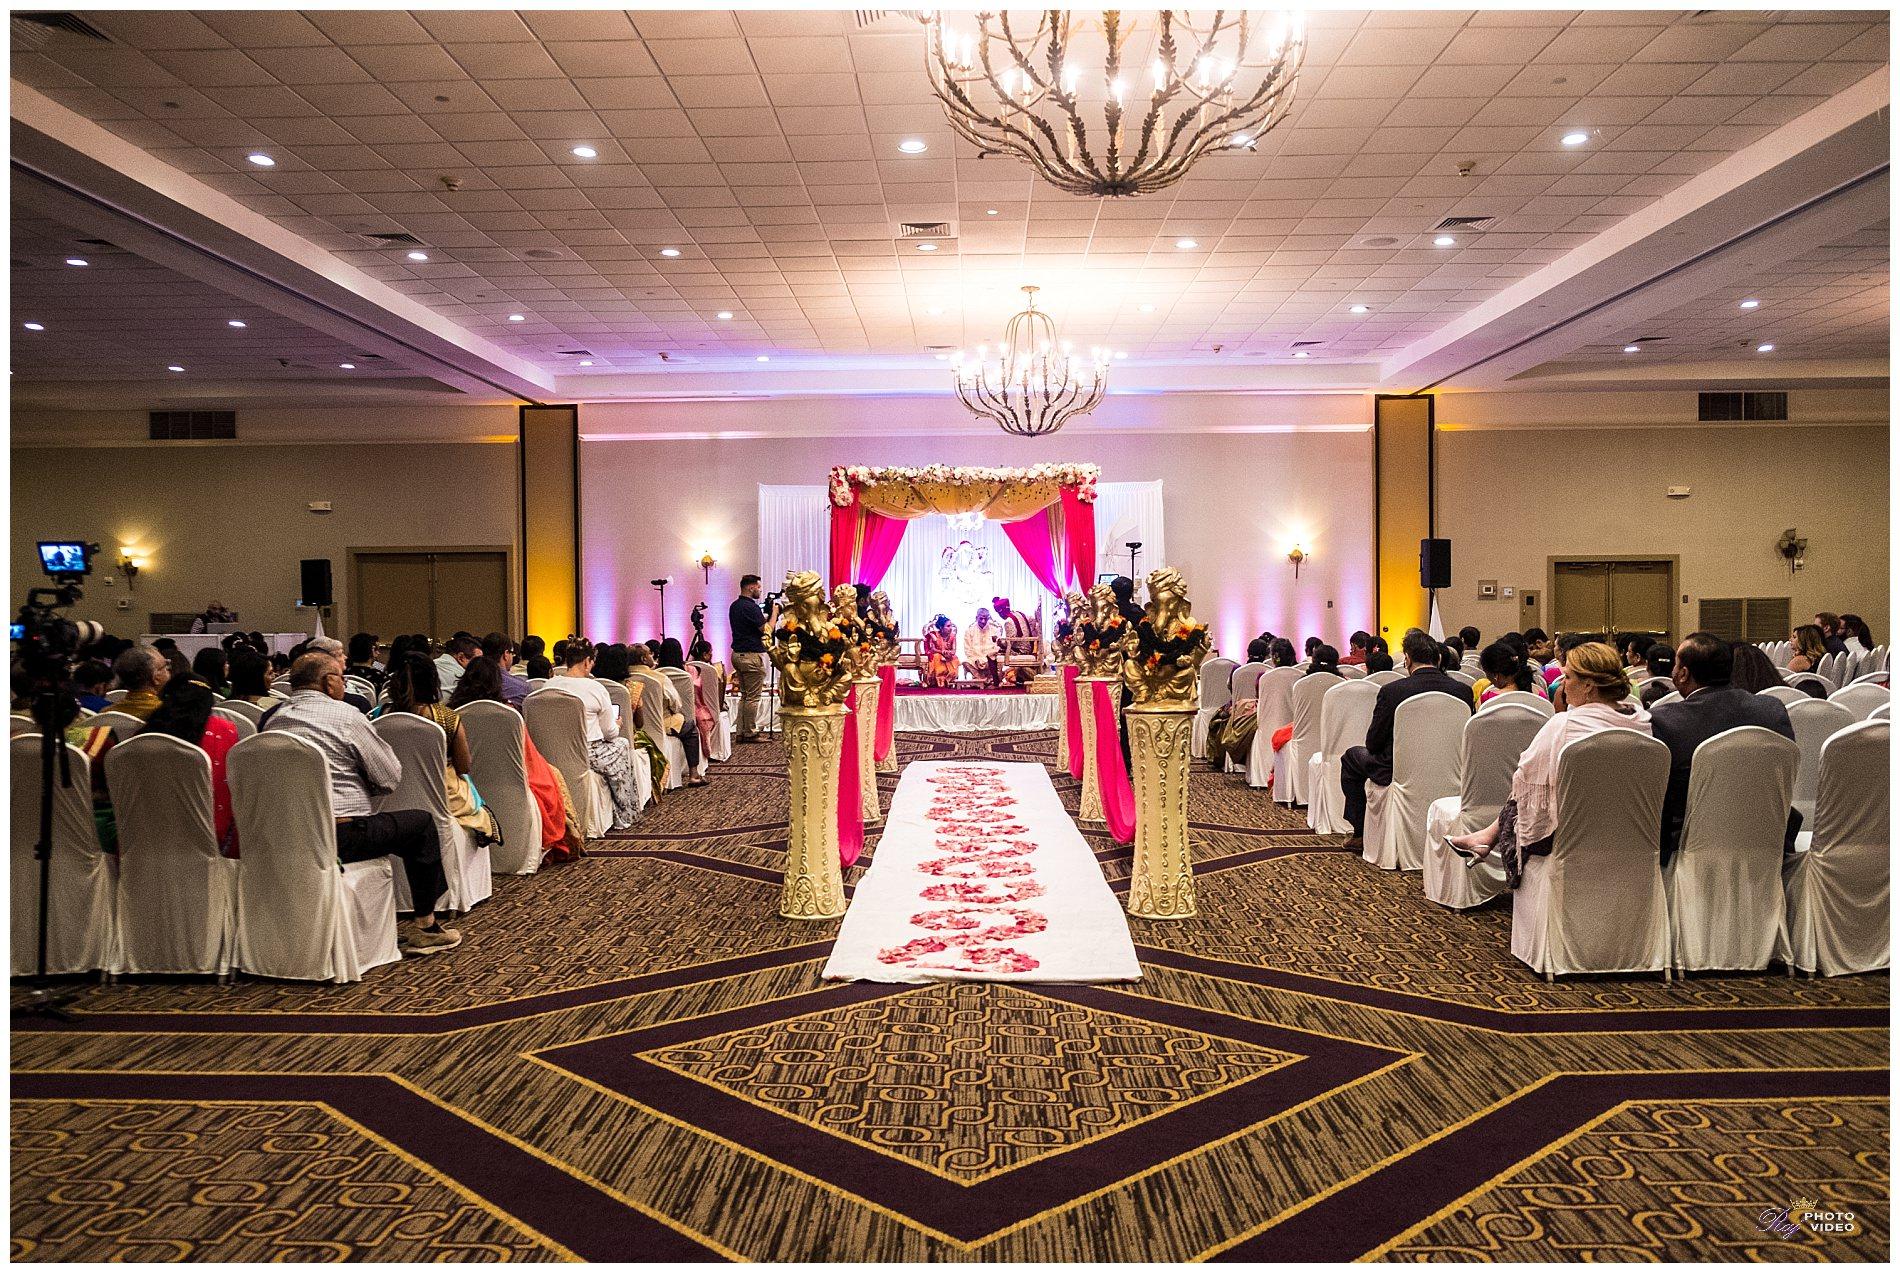 doubletree-by-hilton-hotel-wilmington-de-wedding-krishna-ritesh-53.jpg